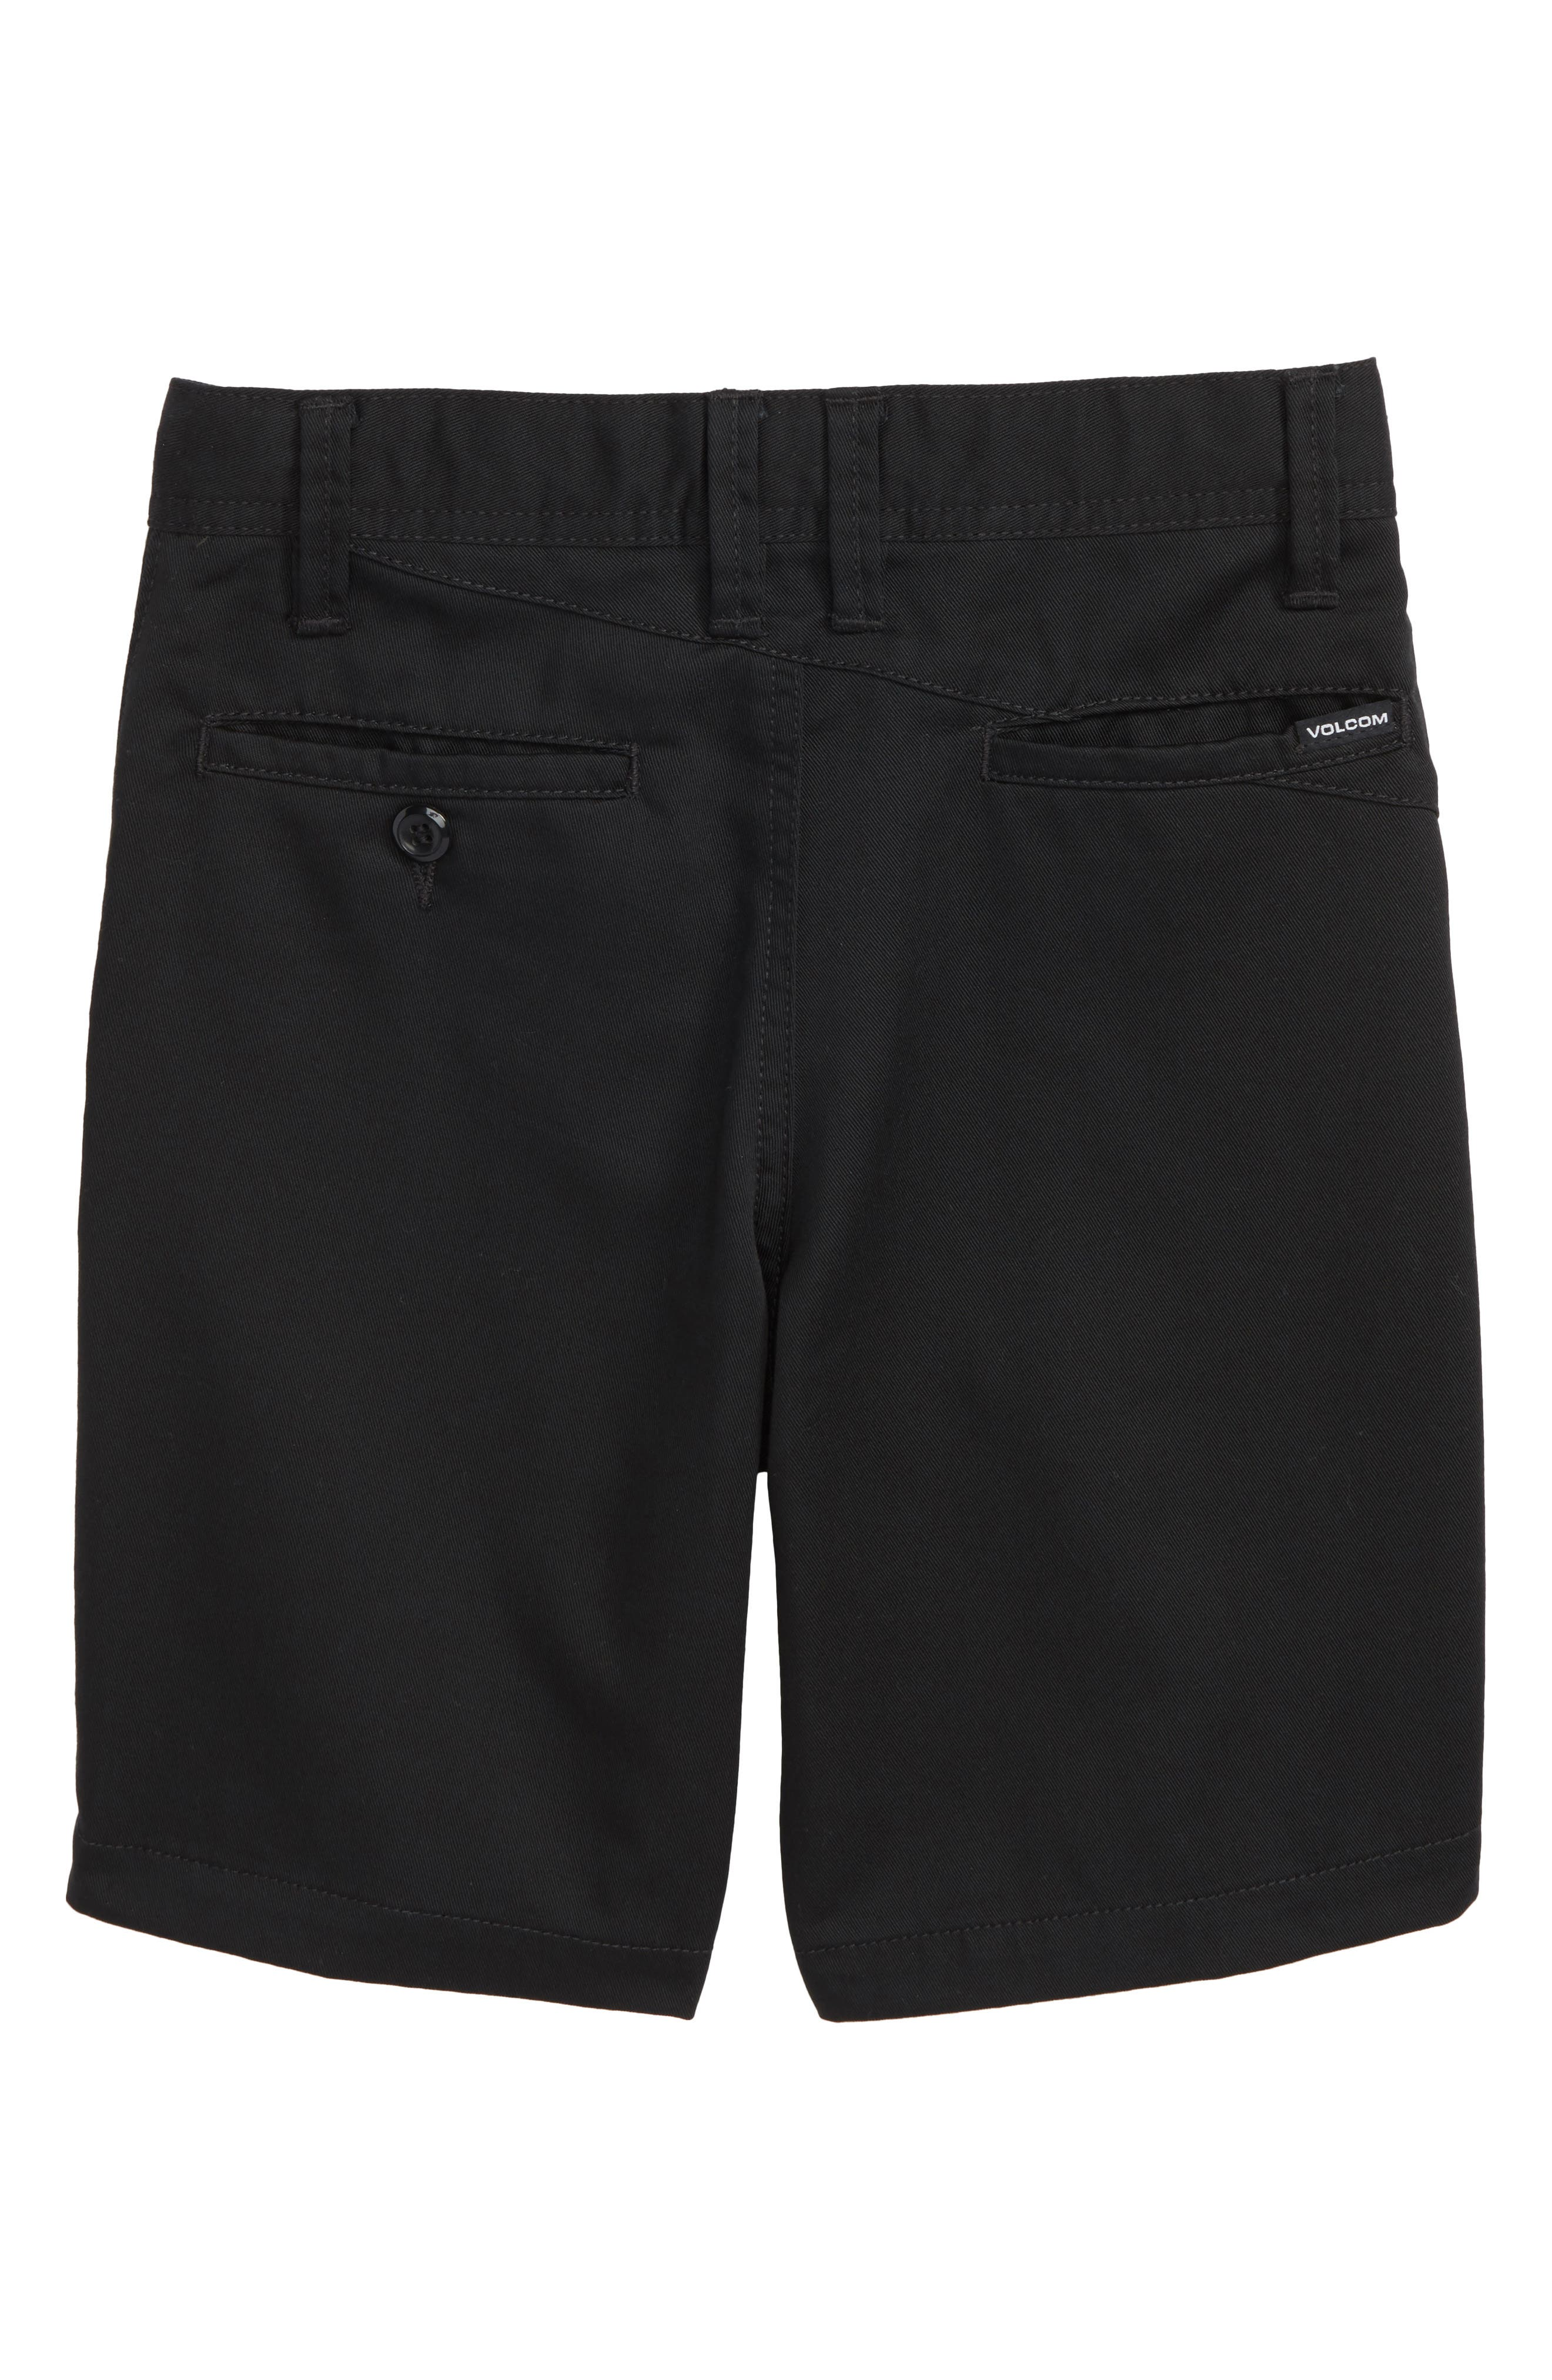 Chino Shorts,                             Alternate thumbnail 2, color,                             BLACK